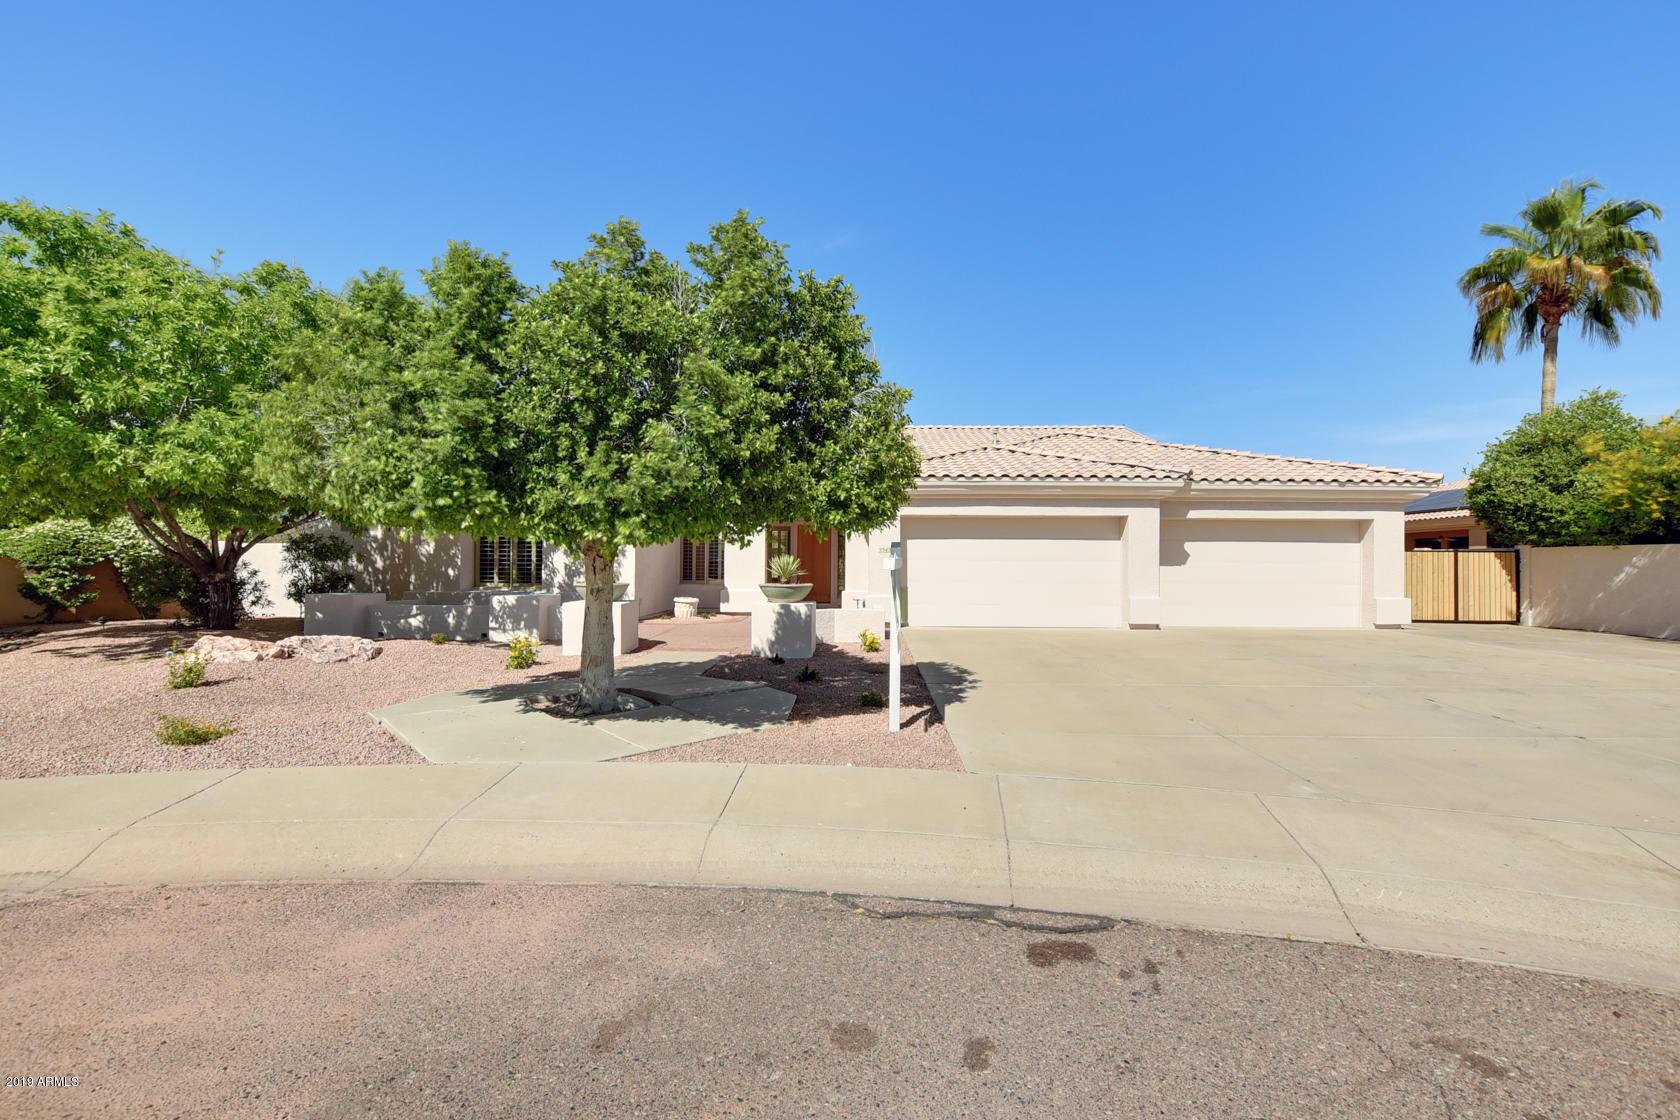 Photo of 5542 W CAMINO VIVAZ --, Glendale, AZ 85310